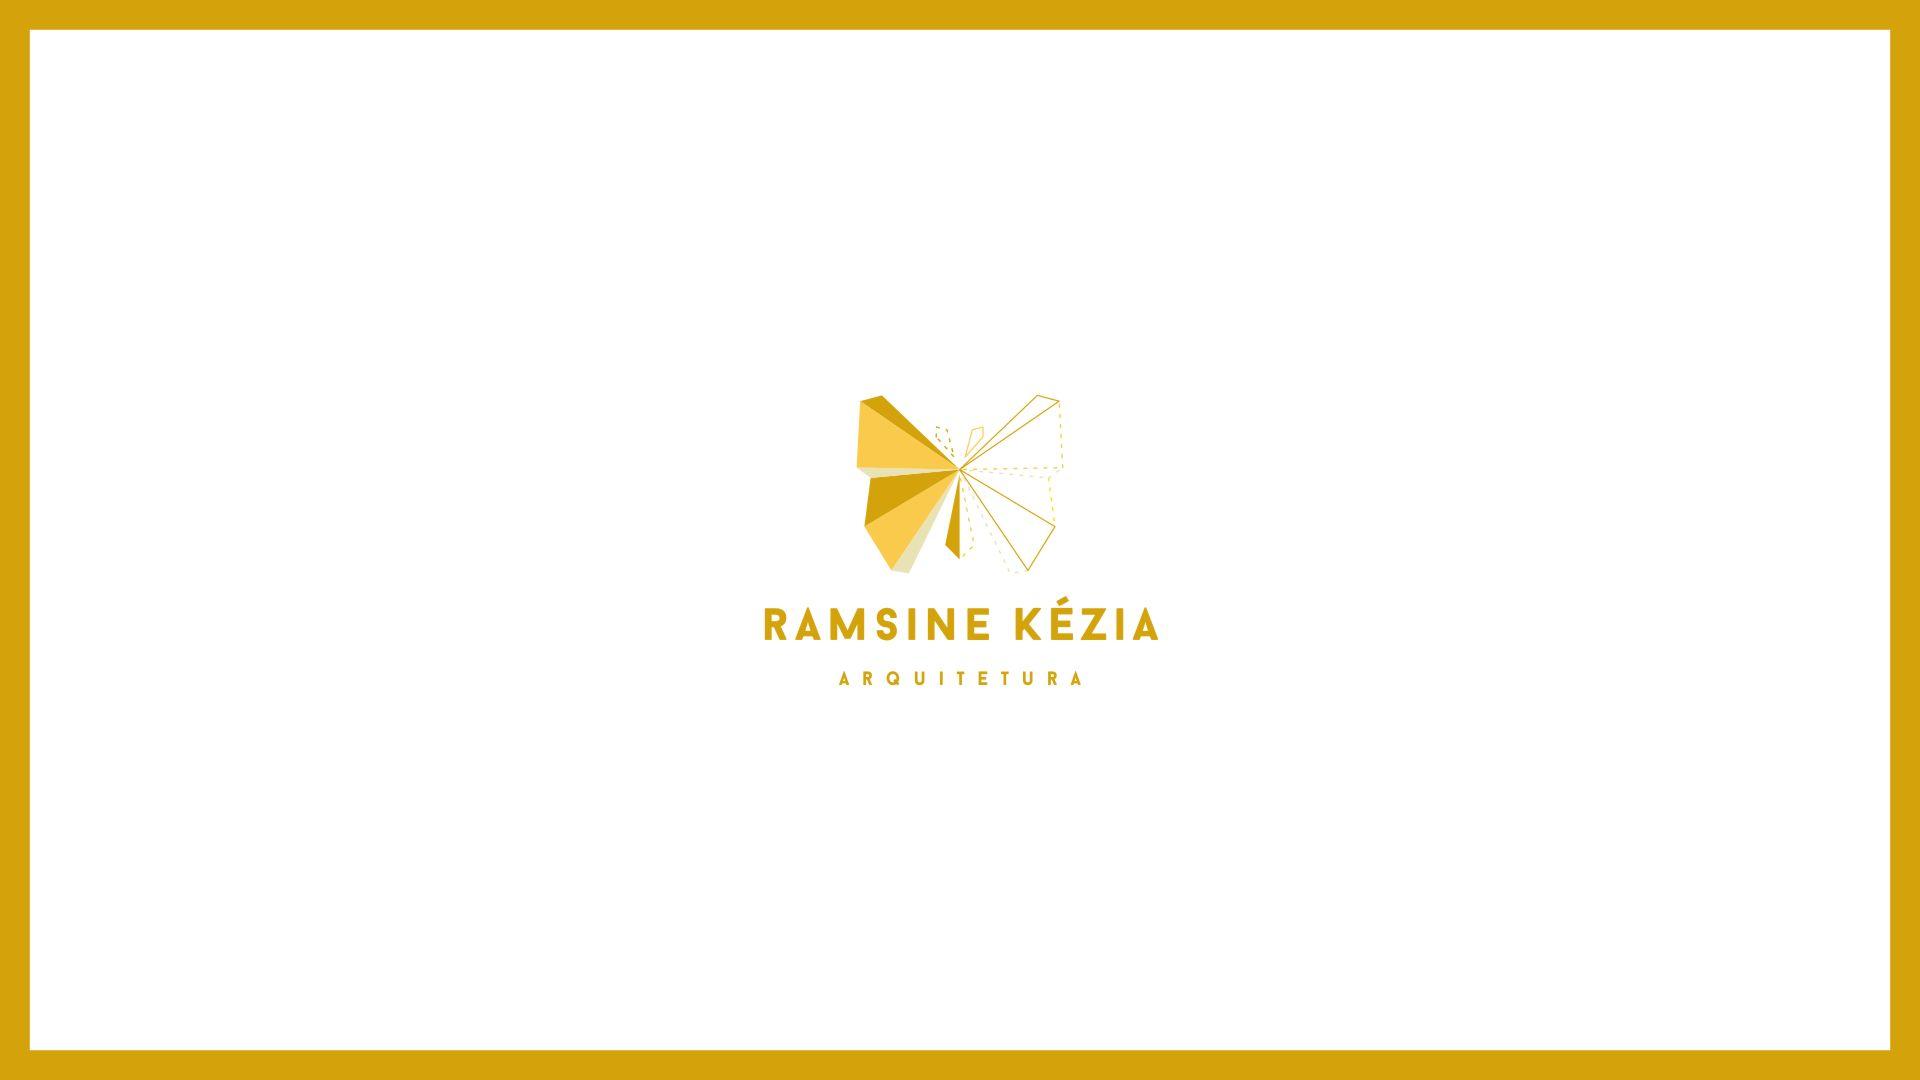 Ramsine